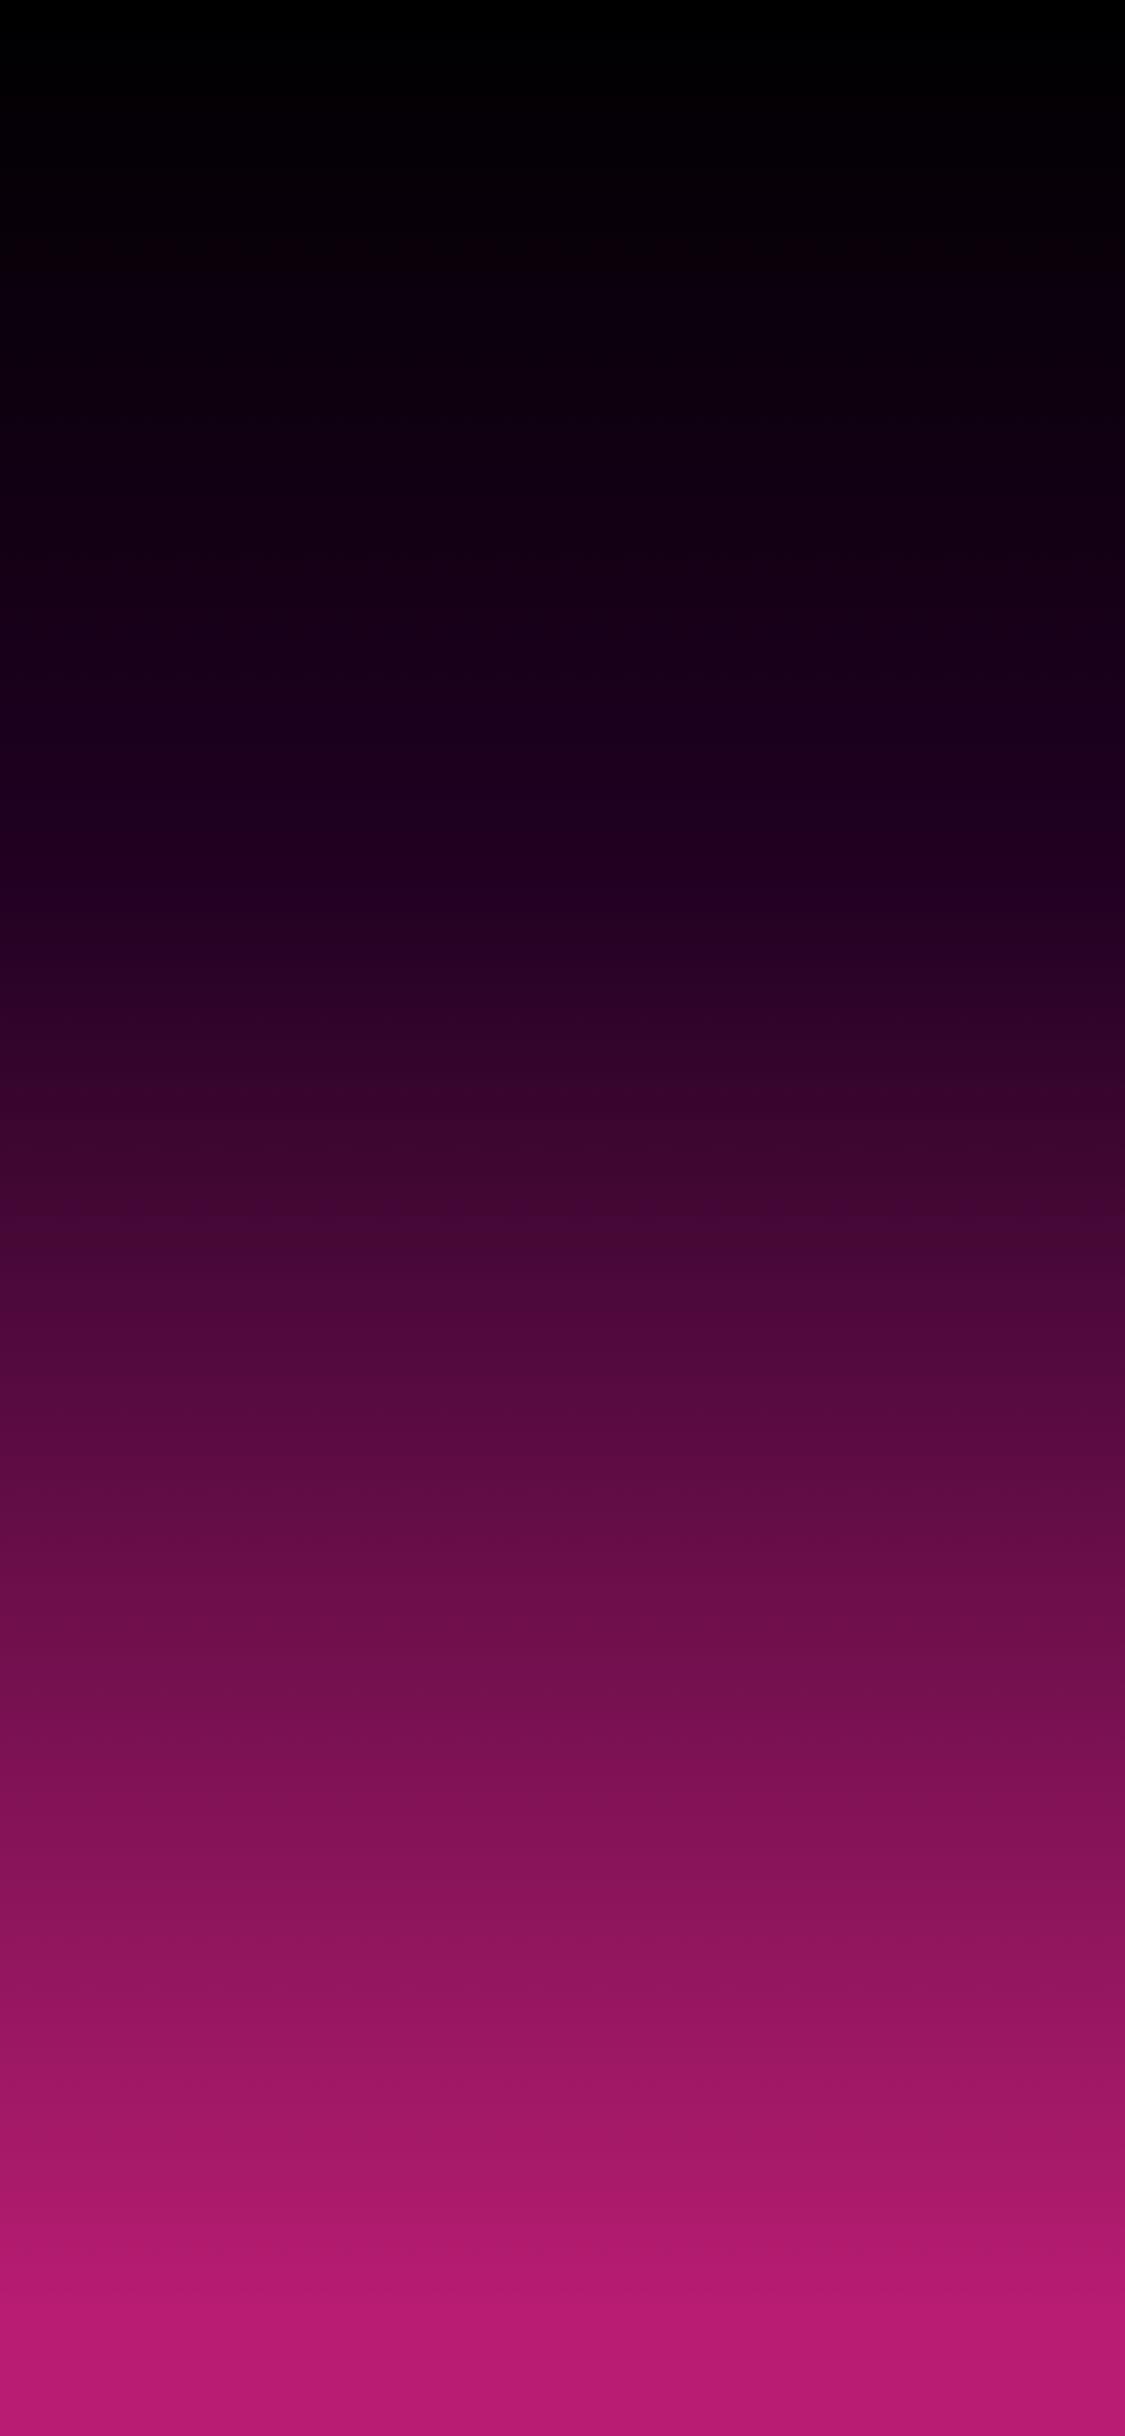 Notchless Wallpaper Iphone X แจกภาพพื้นหลัง Wallpaper ชุด Notchless Gradient สำหรับ